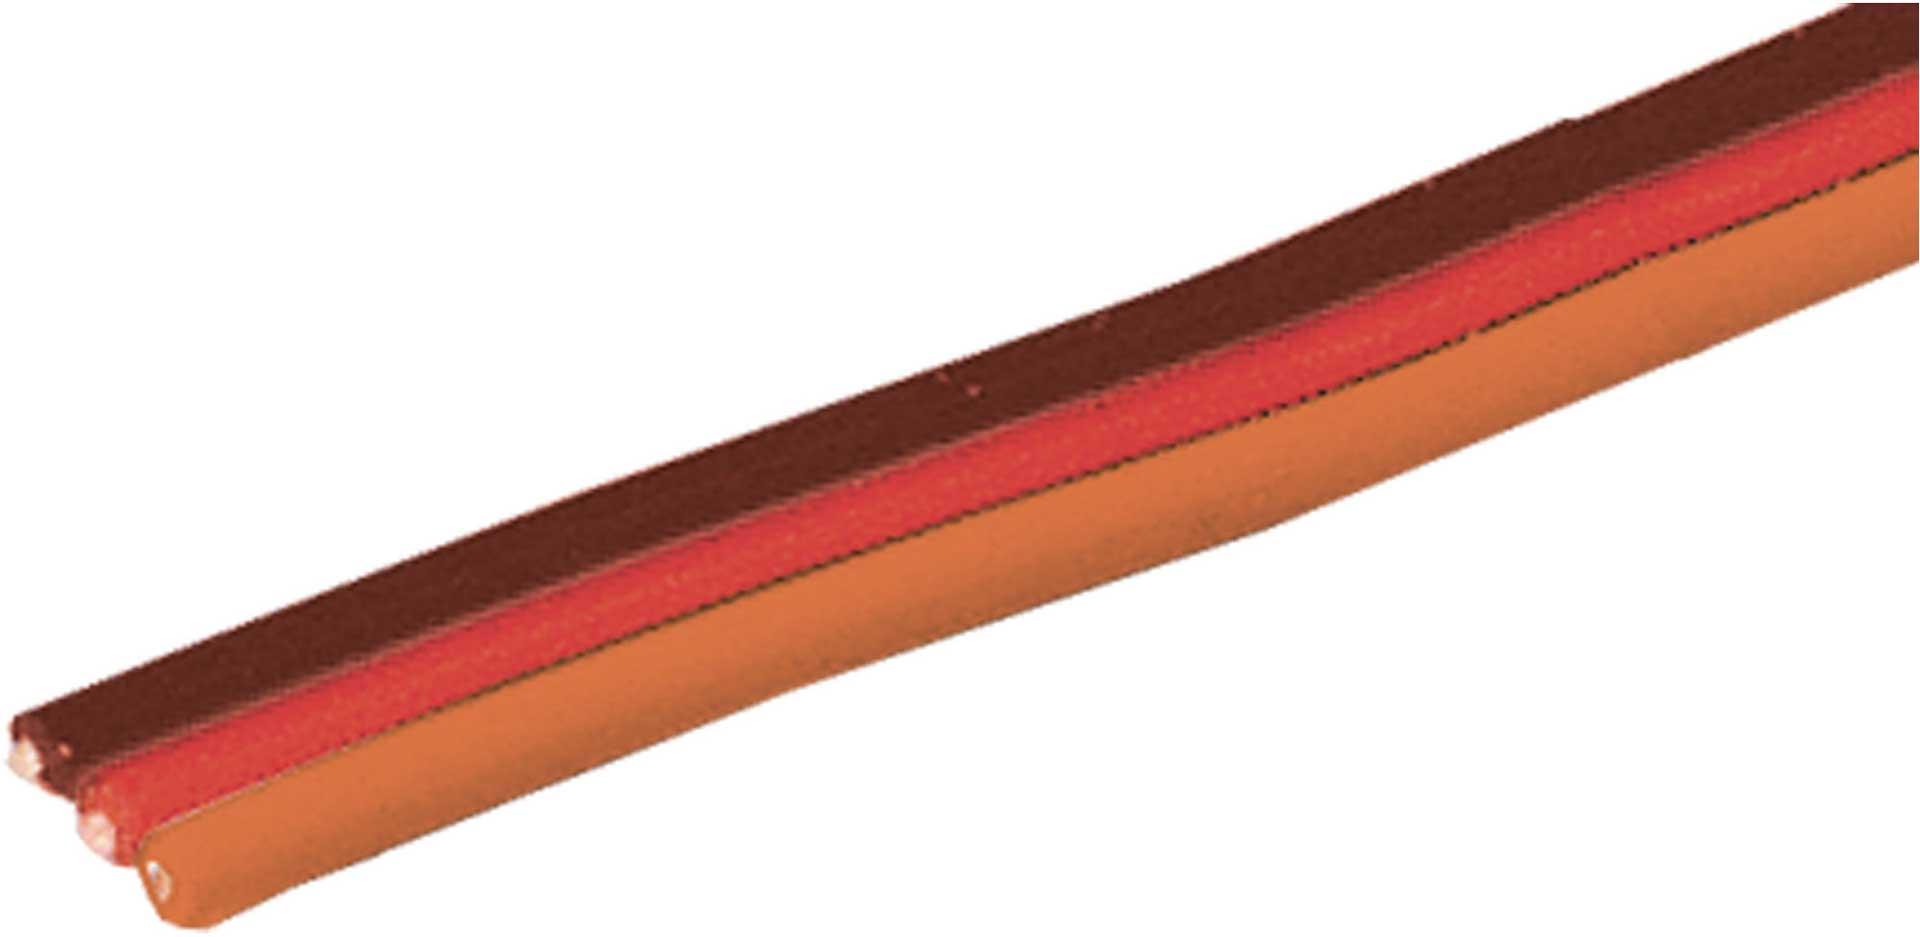 Robbe Modellsport Servokabel Graupner/JR/Uni 50 Meter flach 0,33mm² (22AWG) PVC Meterware